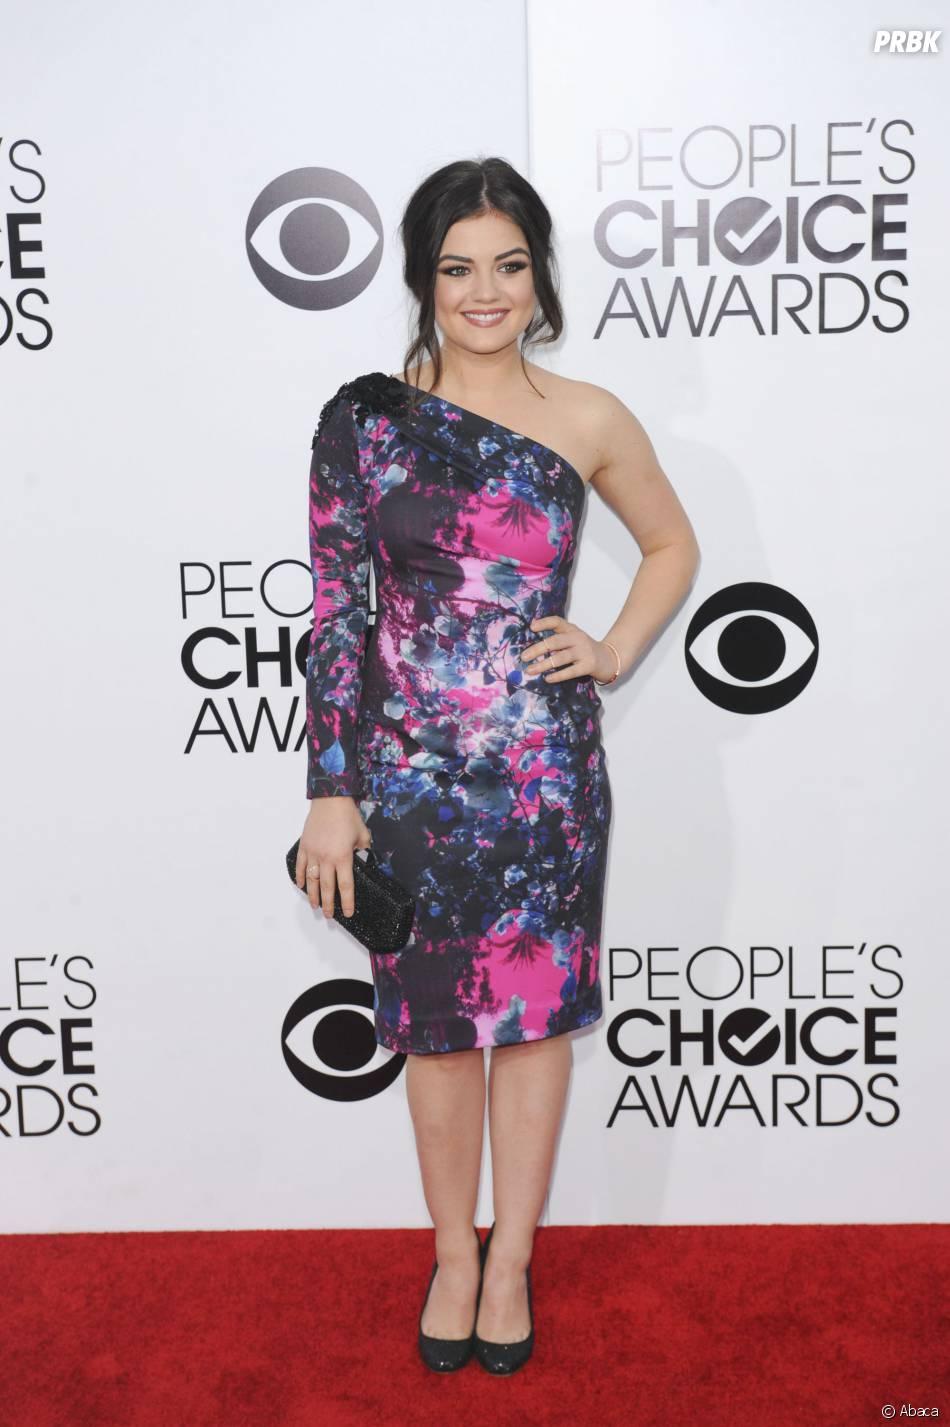 People's Choice Awards 2014 : Lucy Hale gagnante du prix de meilleure actrice du câble